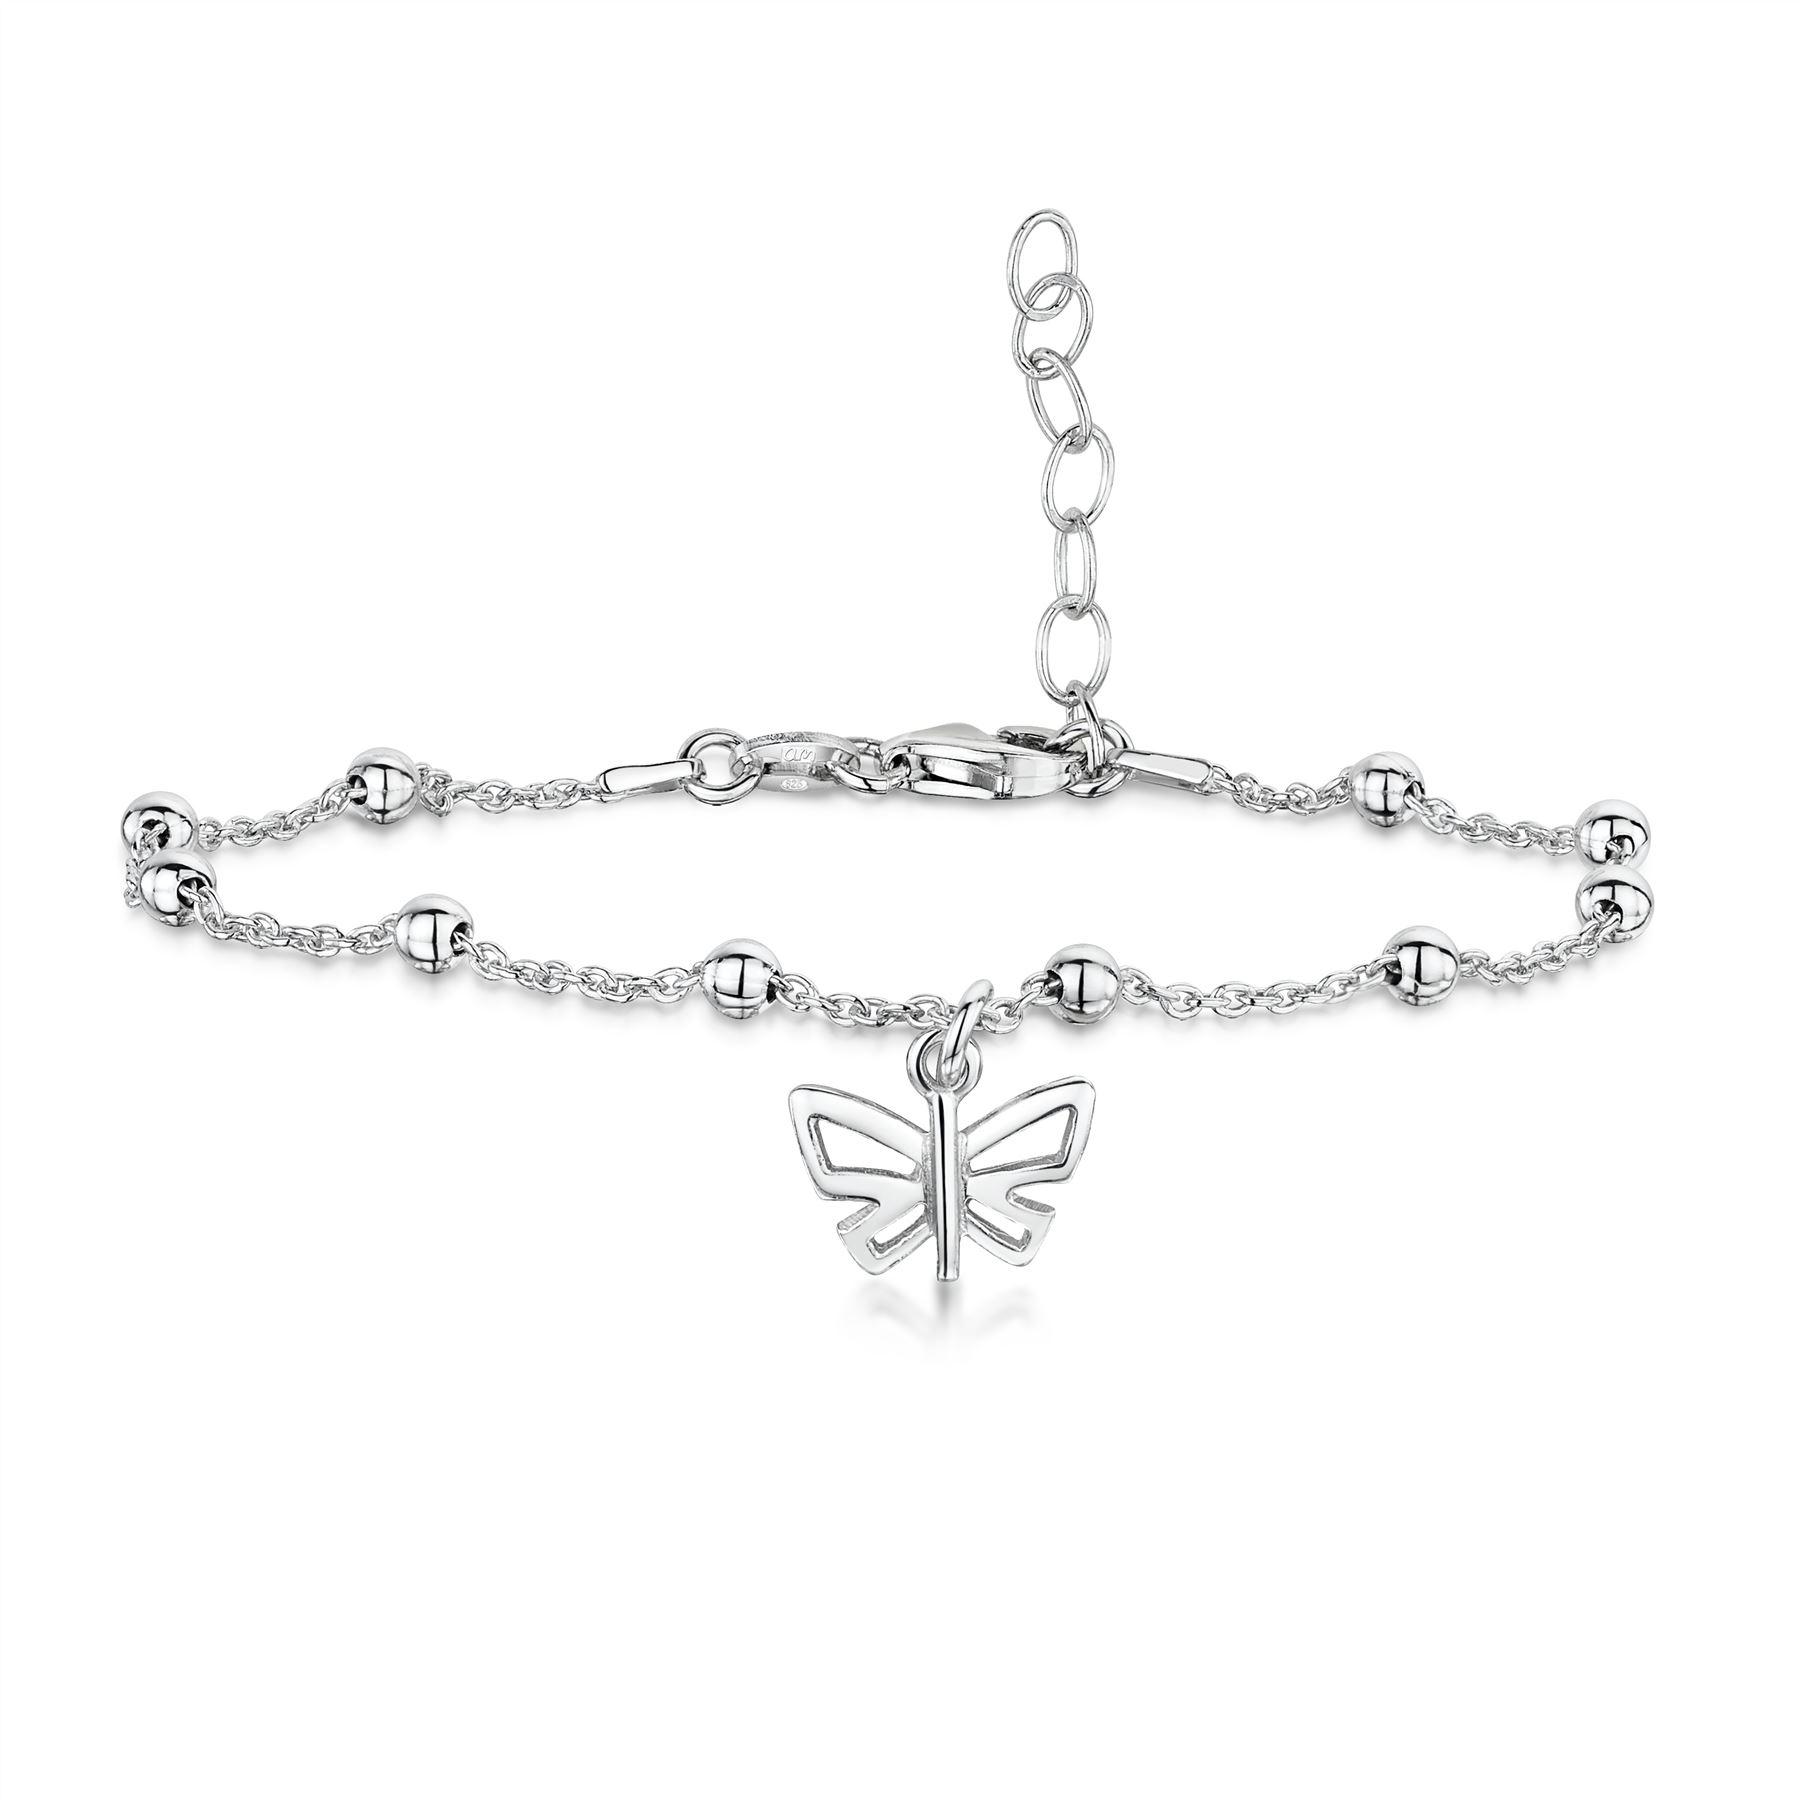 Amberta-Jewelry-925-Sterling-Silver-Adjustable-Bracelet-Italian-Bangle-for-Women thumbnail 36